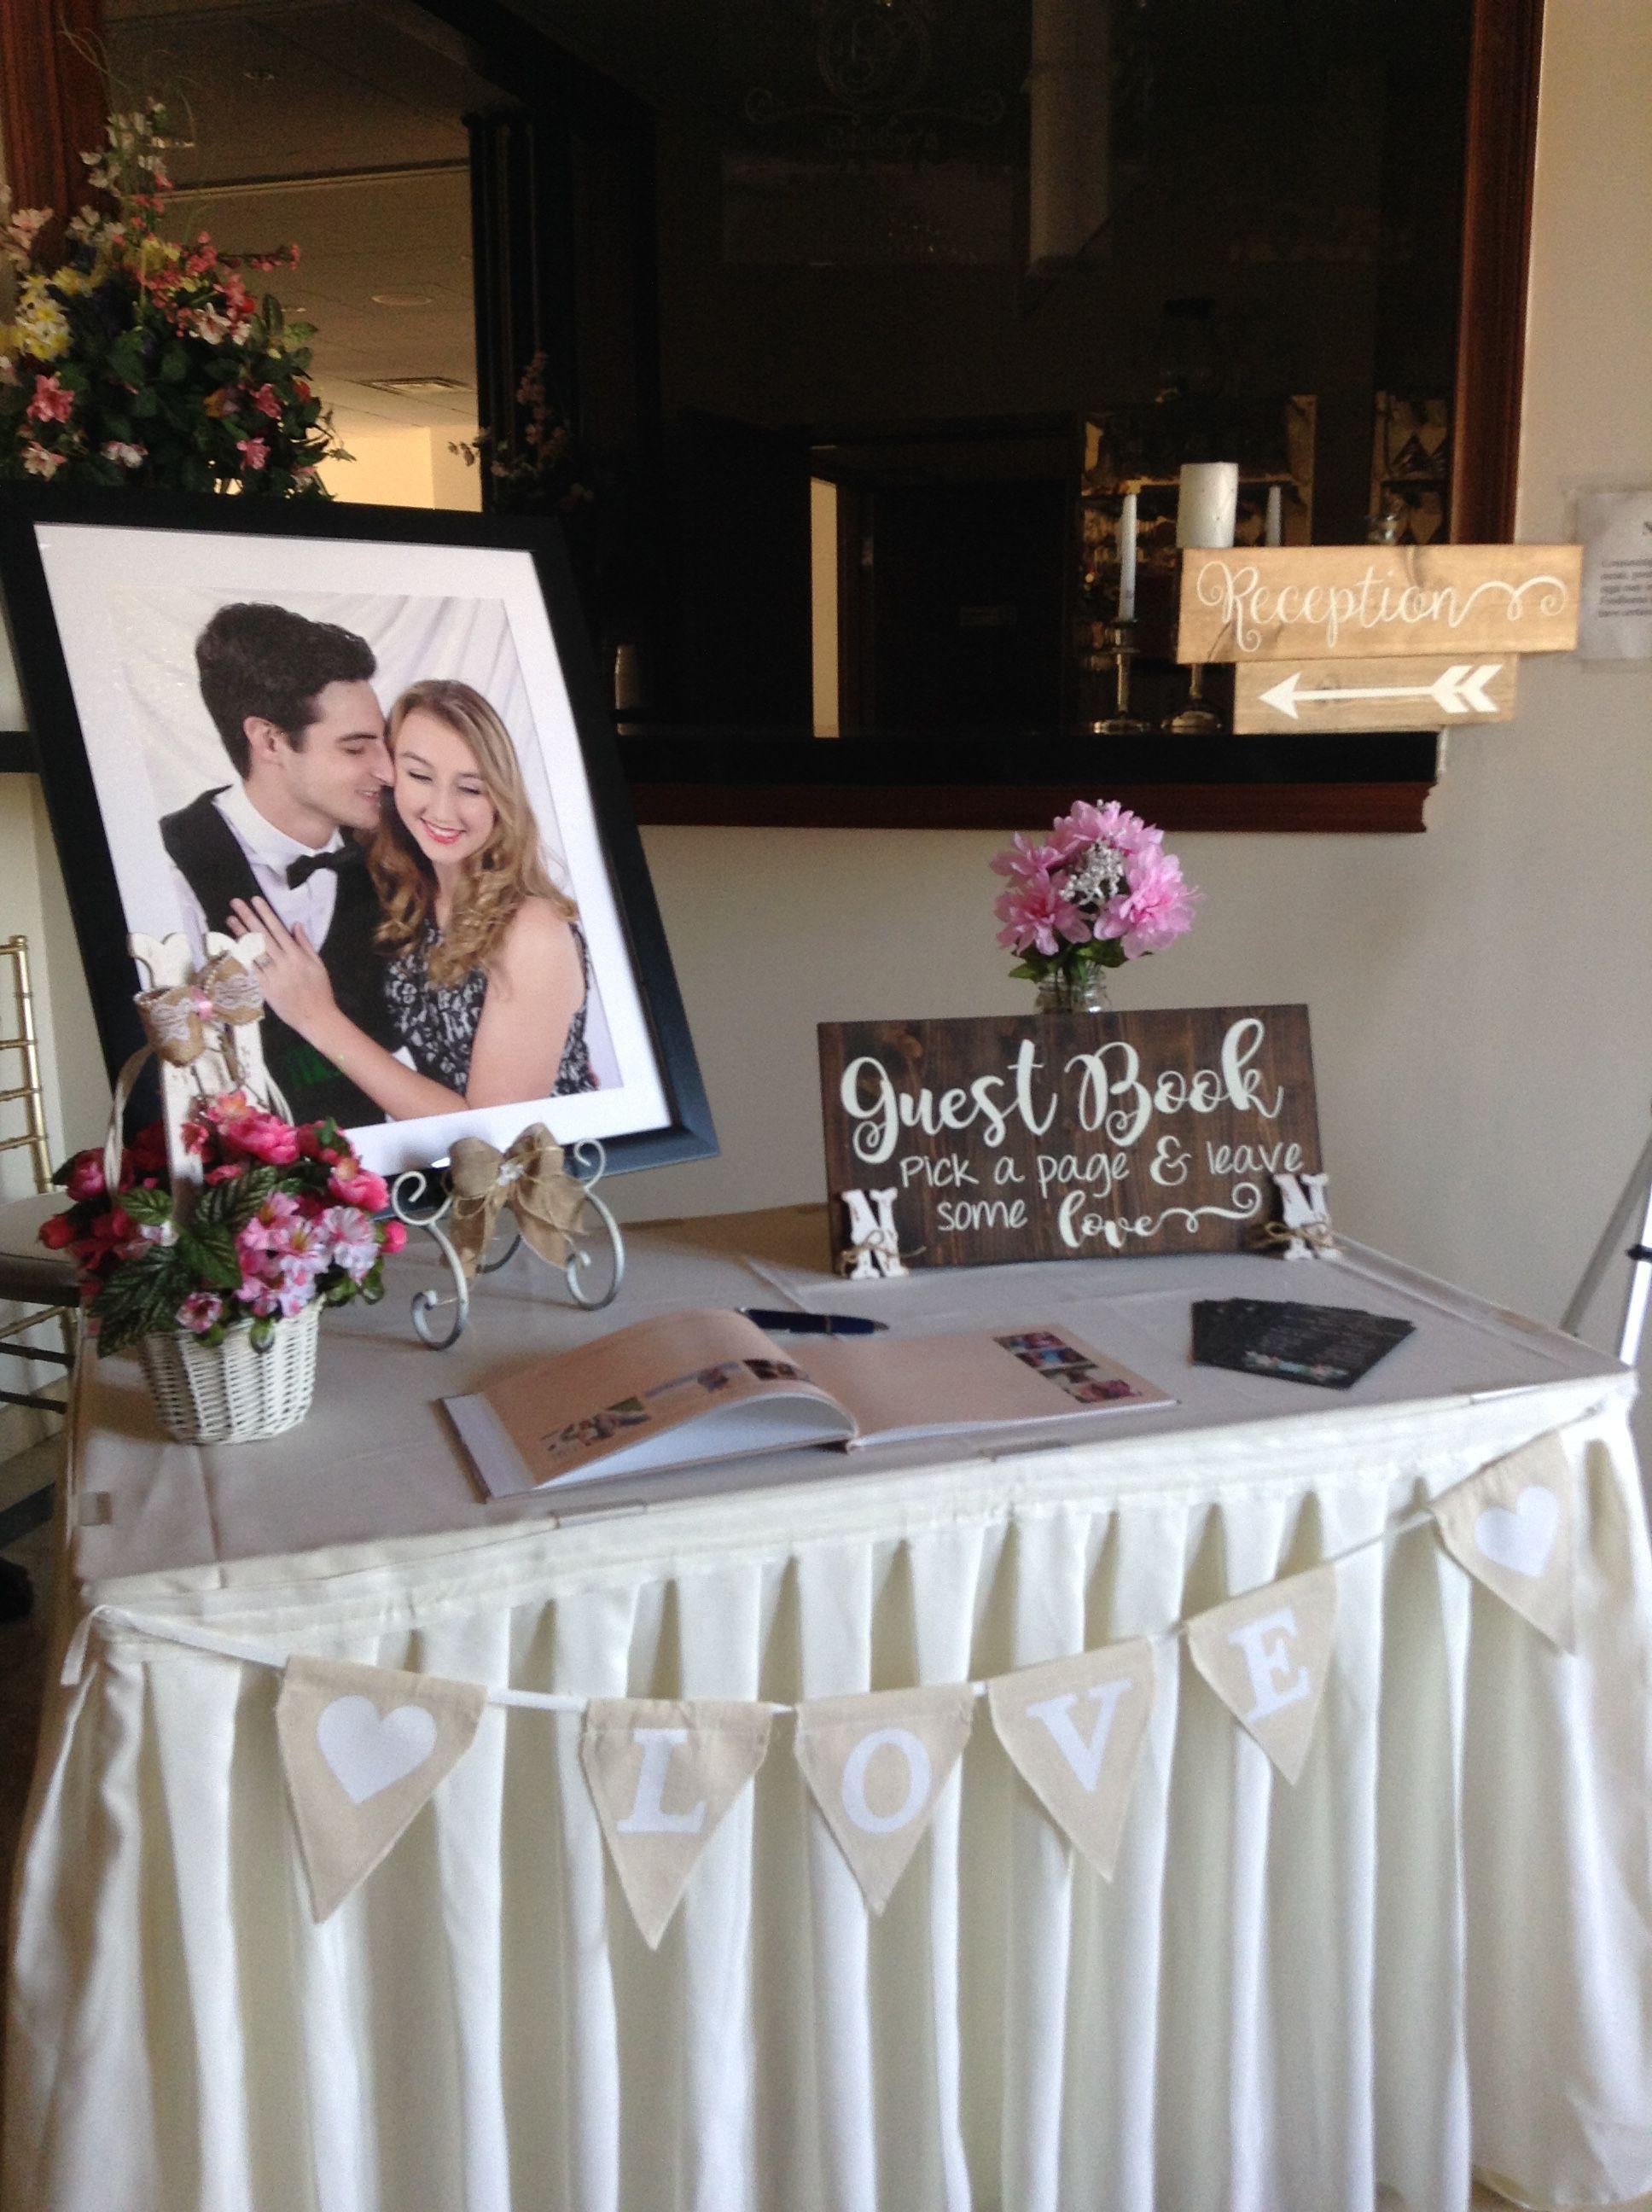 Everything Was Hade Made For This Wedding Entrance Table Weddingtablegiftideasforguests Wedding Welcome Table Wedding Entrance Table Card Table Wedding